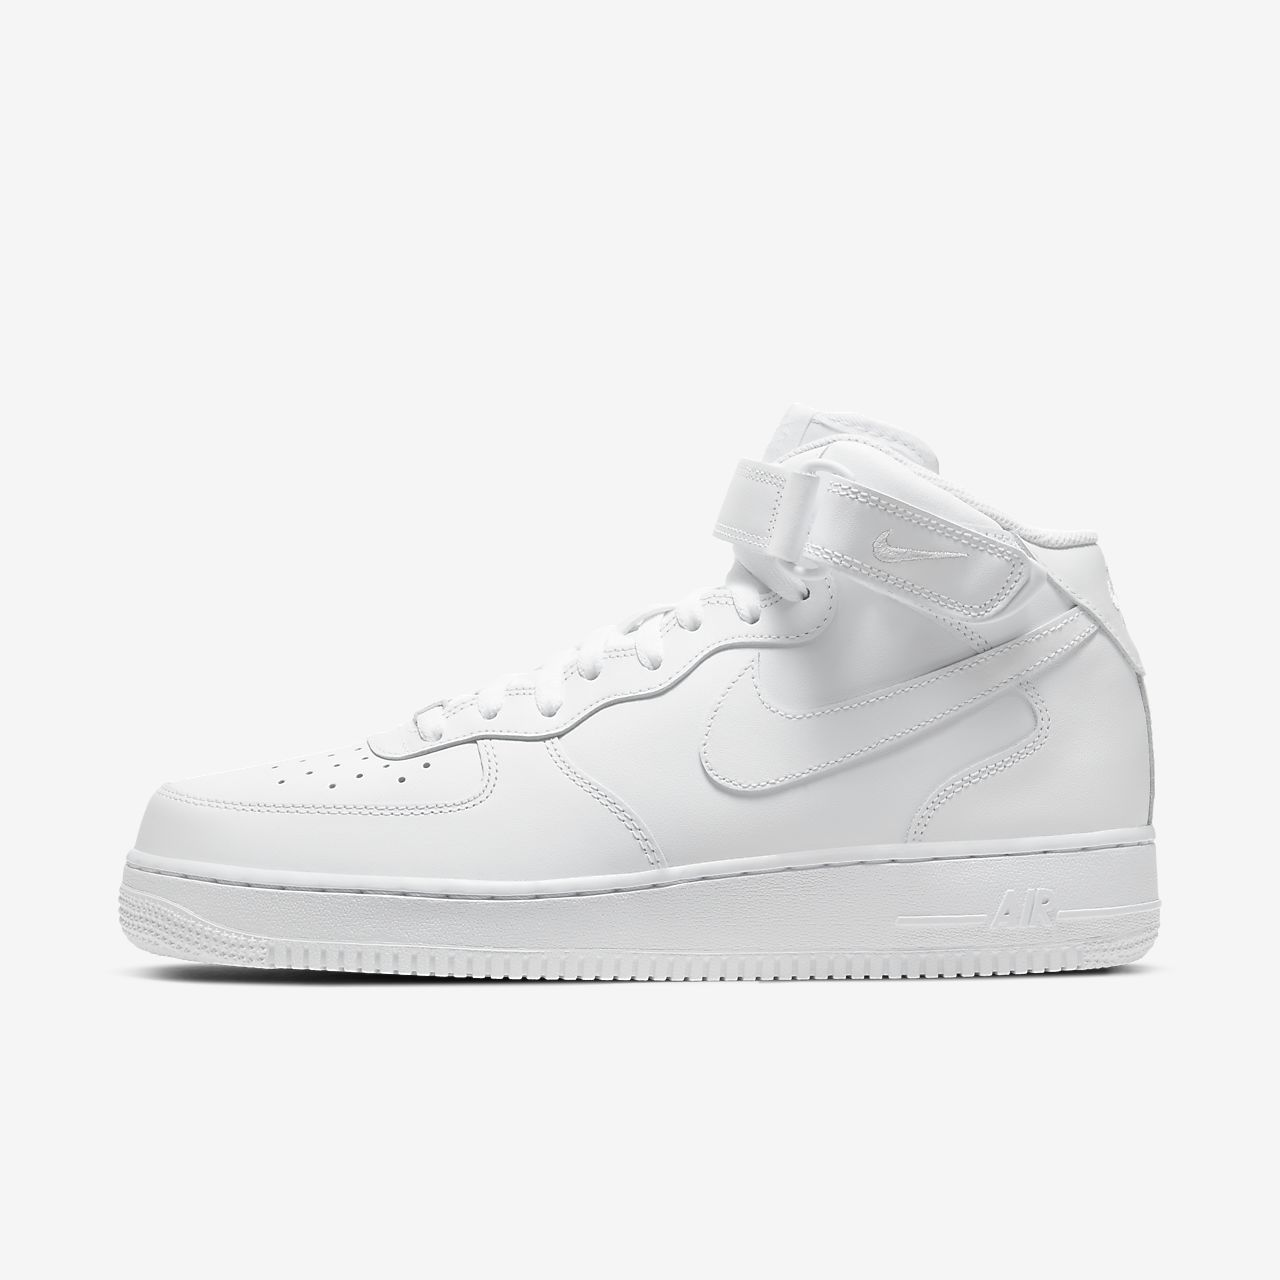 save off 55181 6072e ... Мужские кроссовки Nike Air Force 1 Mid 07